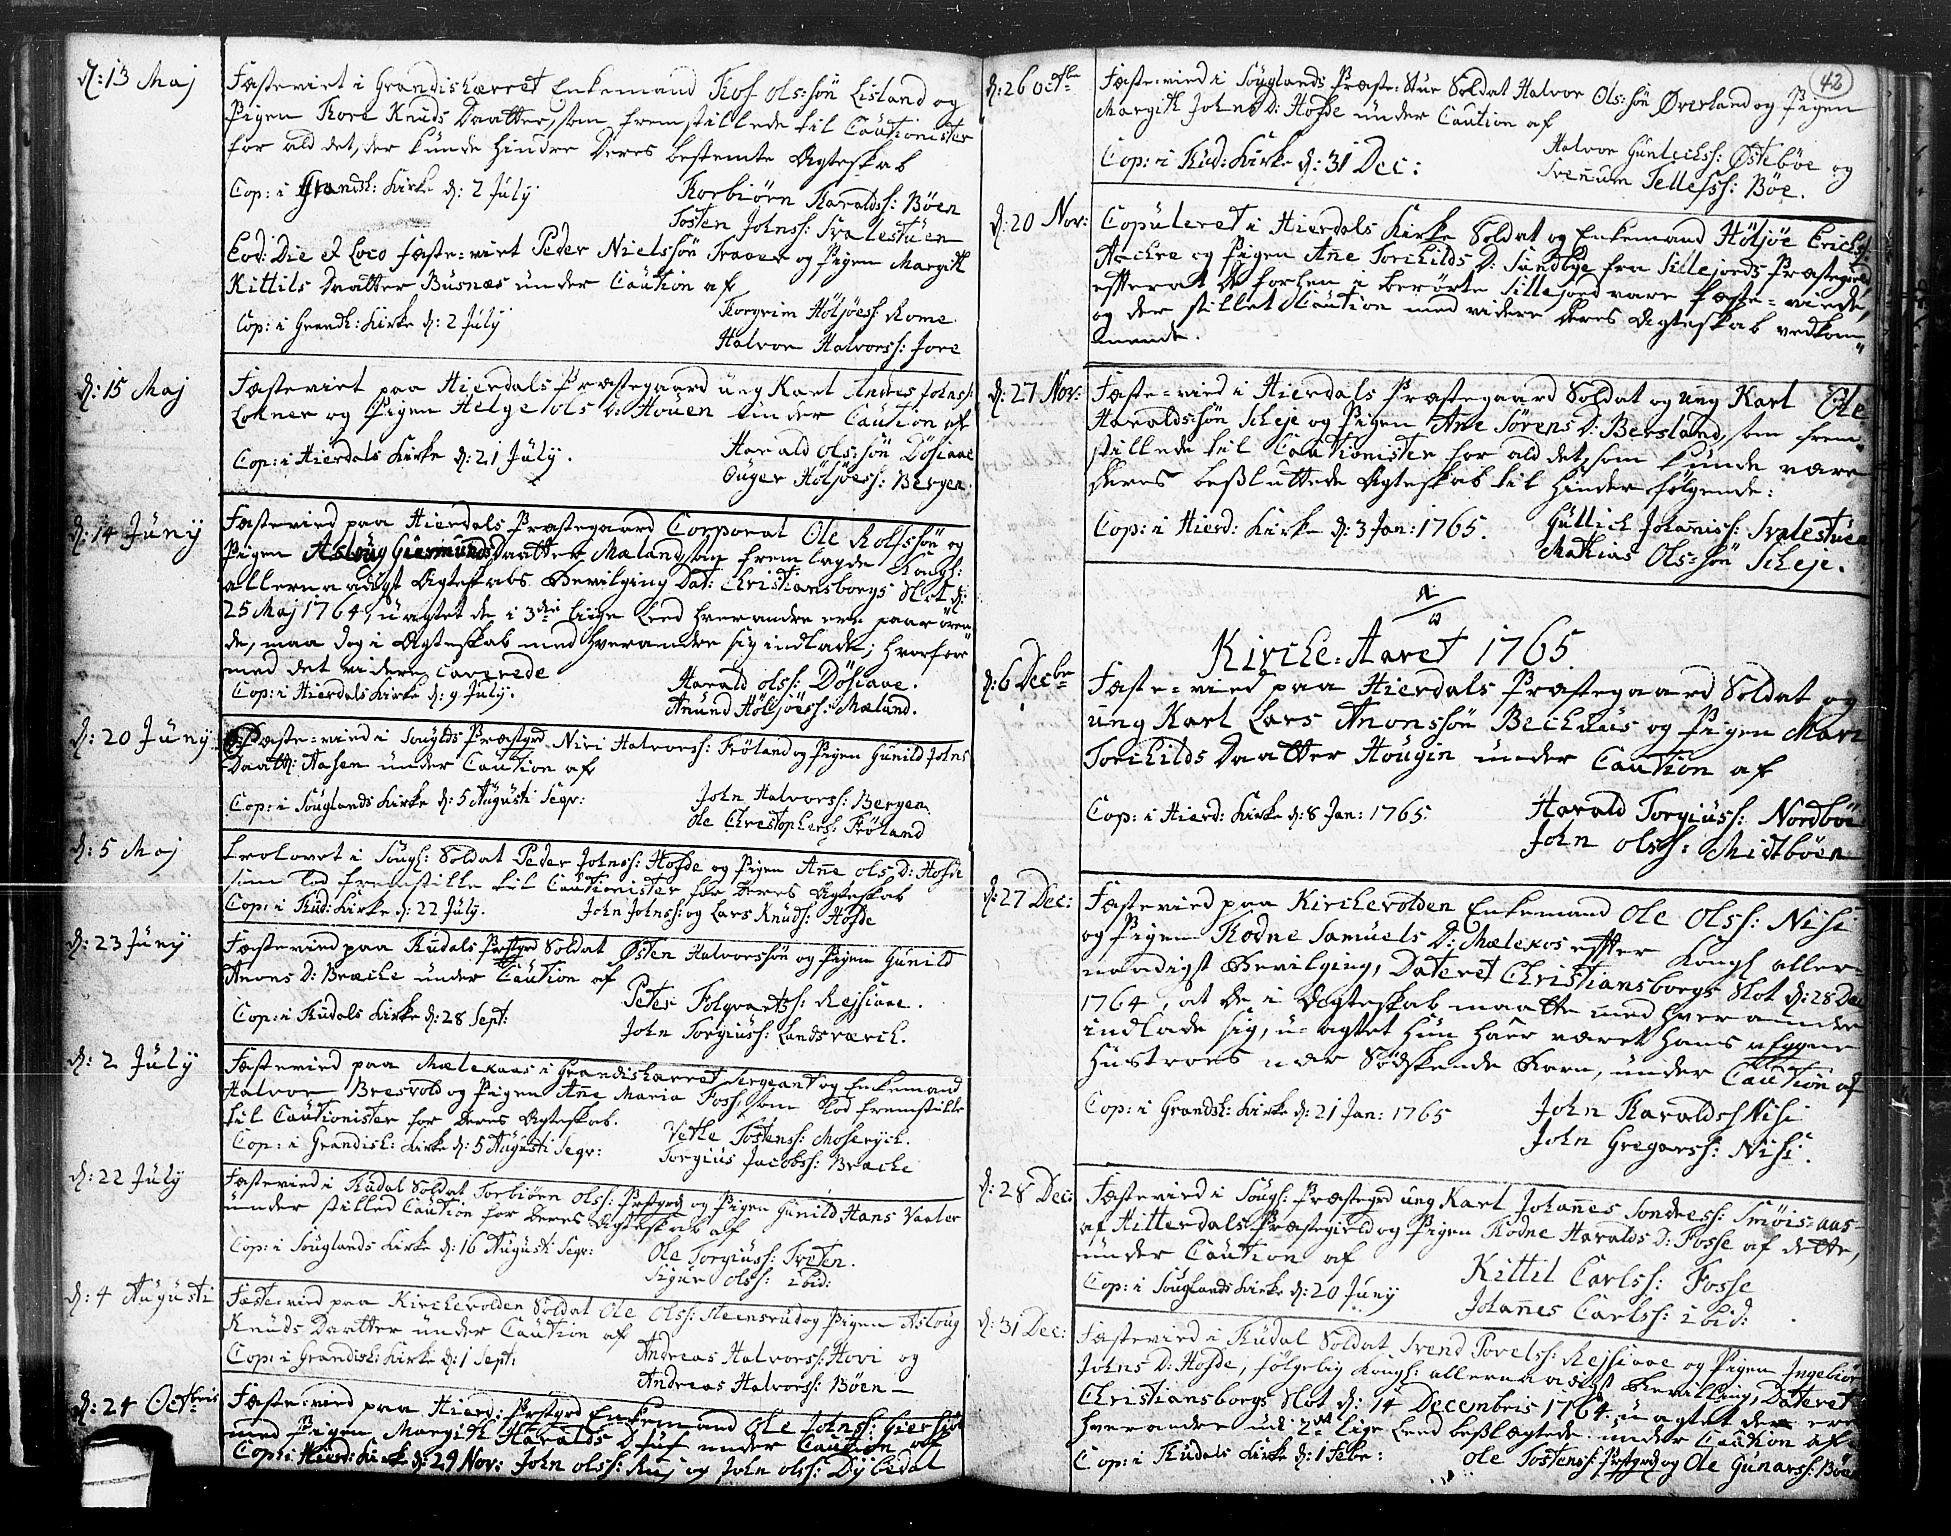 SAKO, Hjartdal kirkebøker, F/Fa/L0004: Ministerialbok nr. I 4, 1727-1795, s. 42